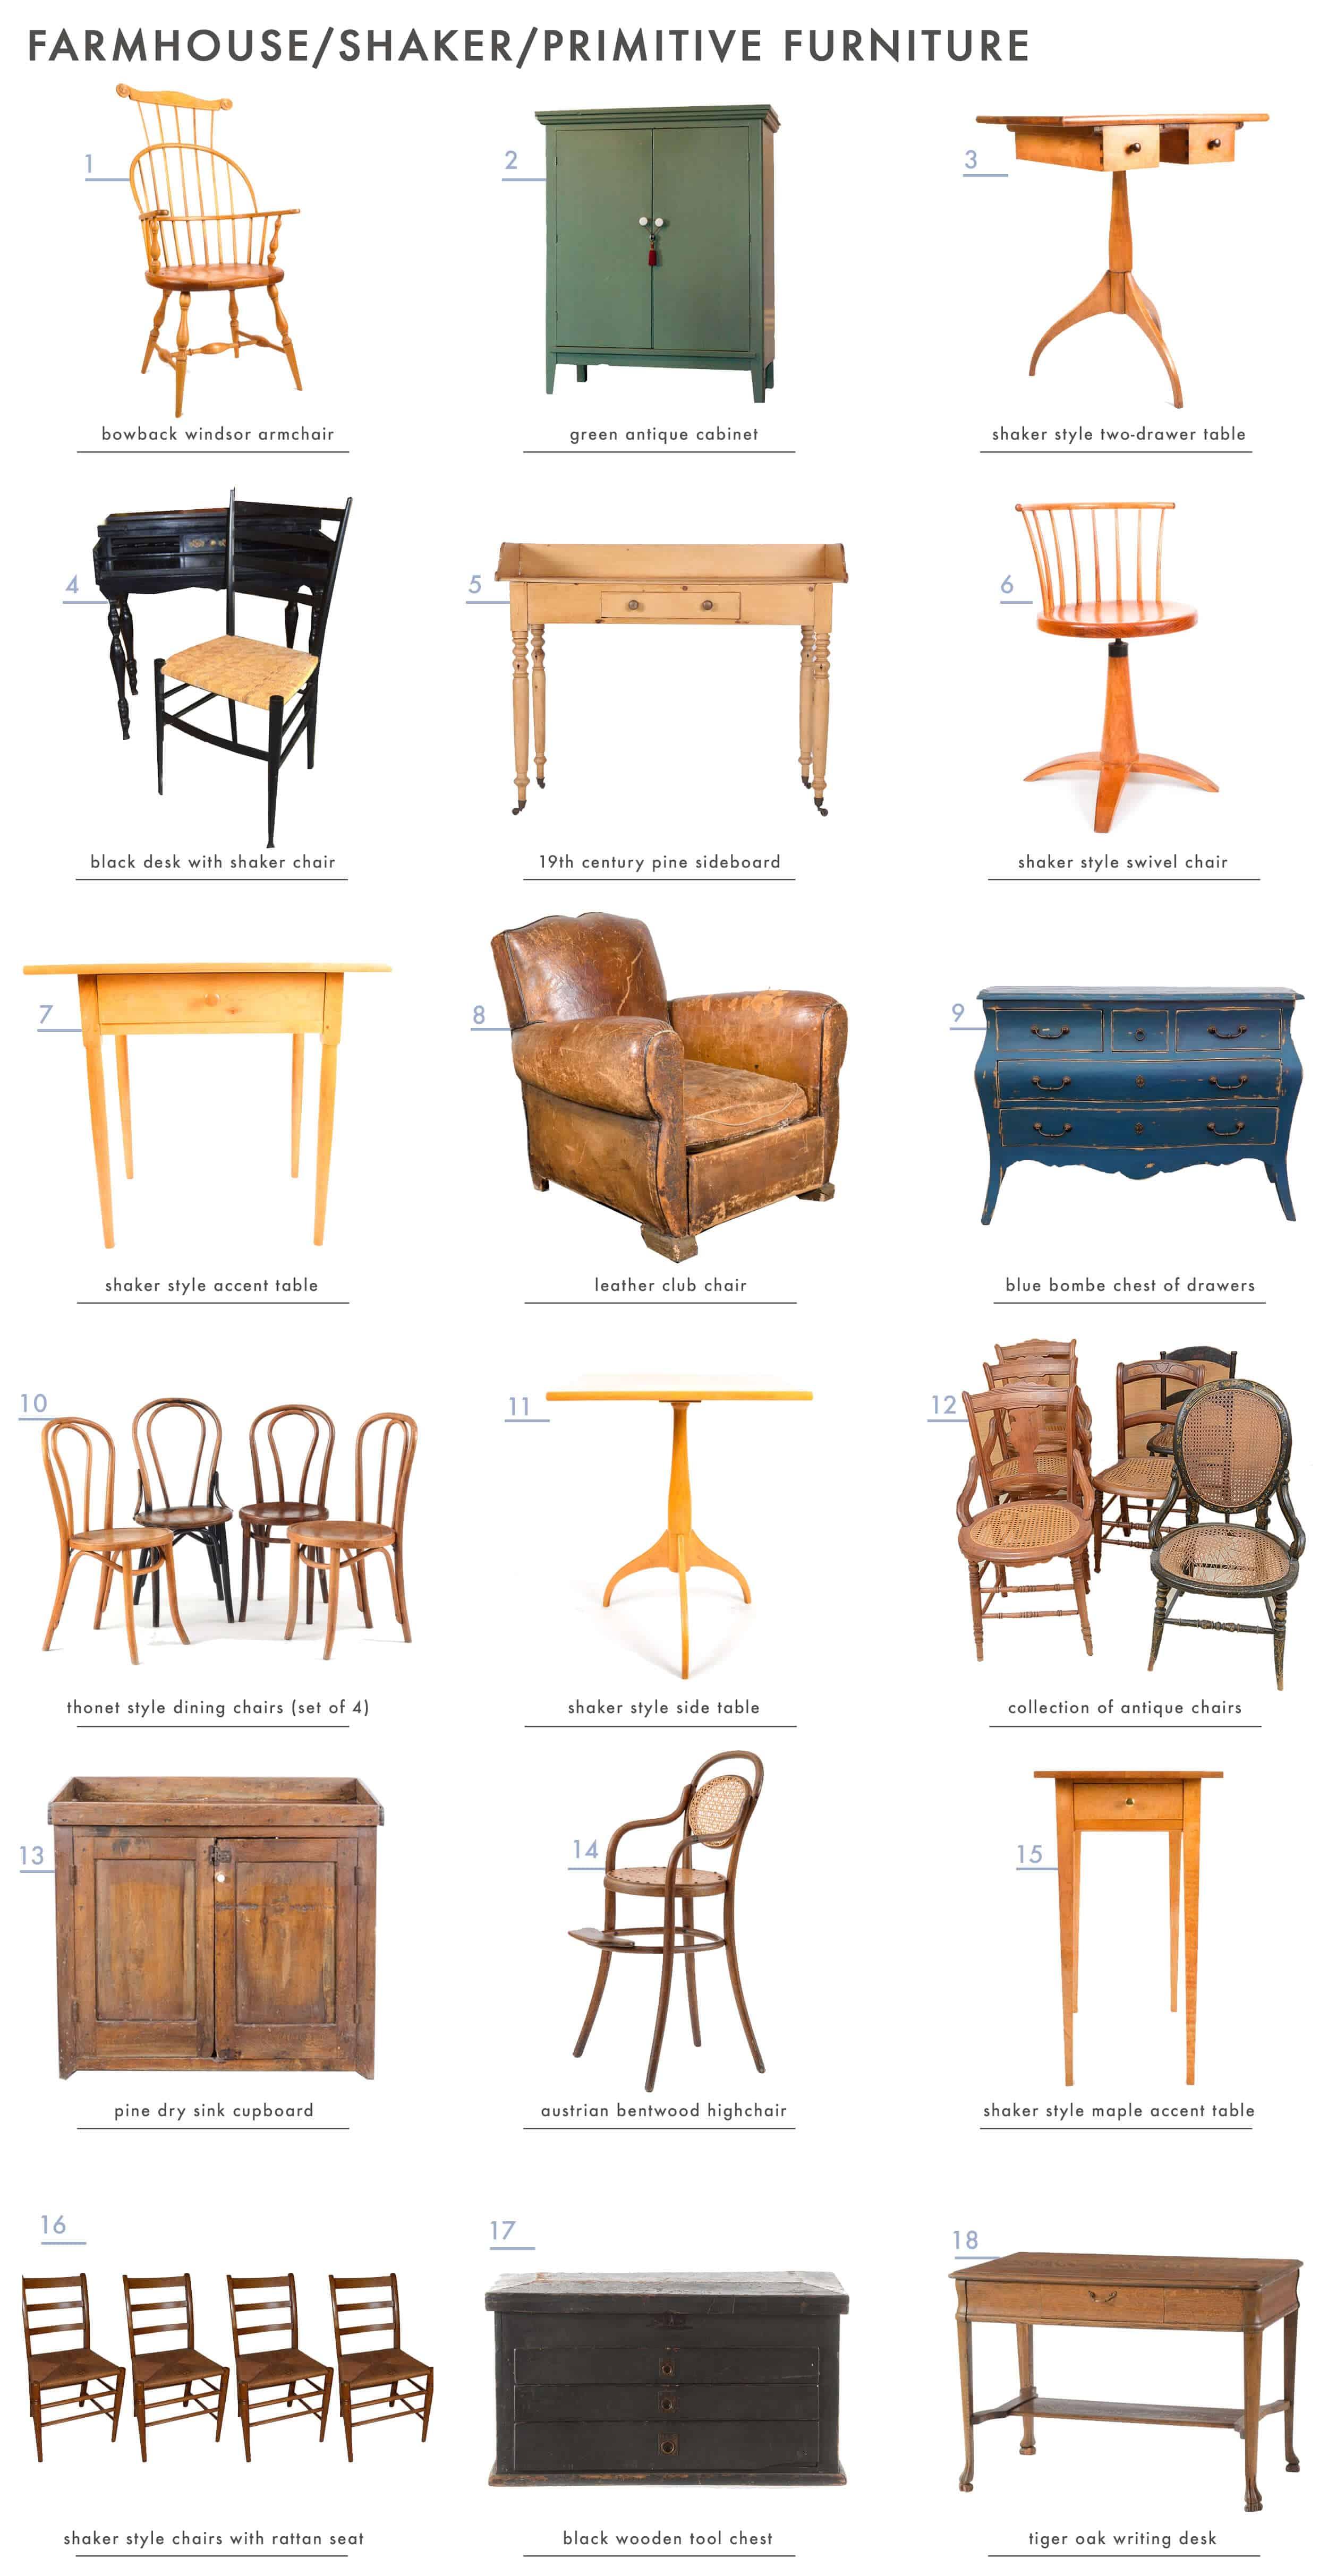 Emily-Henderson_EBTH_Auction_Vintage_Picks_Farmhouse-Shaker-Primative-Furniture2